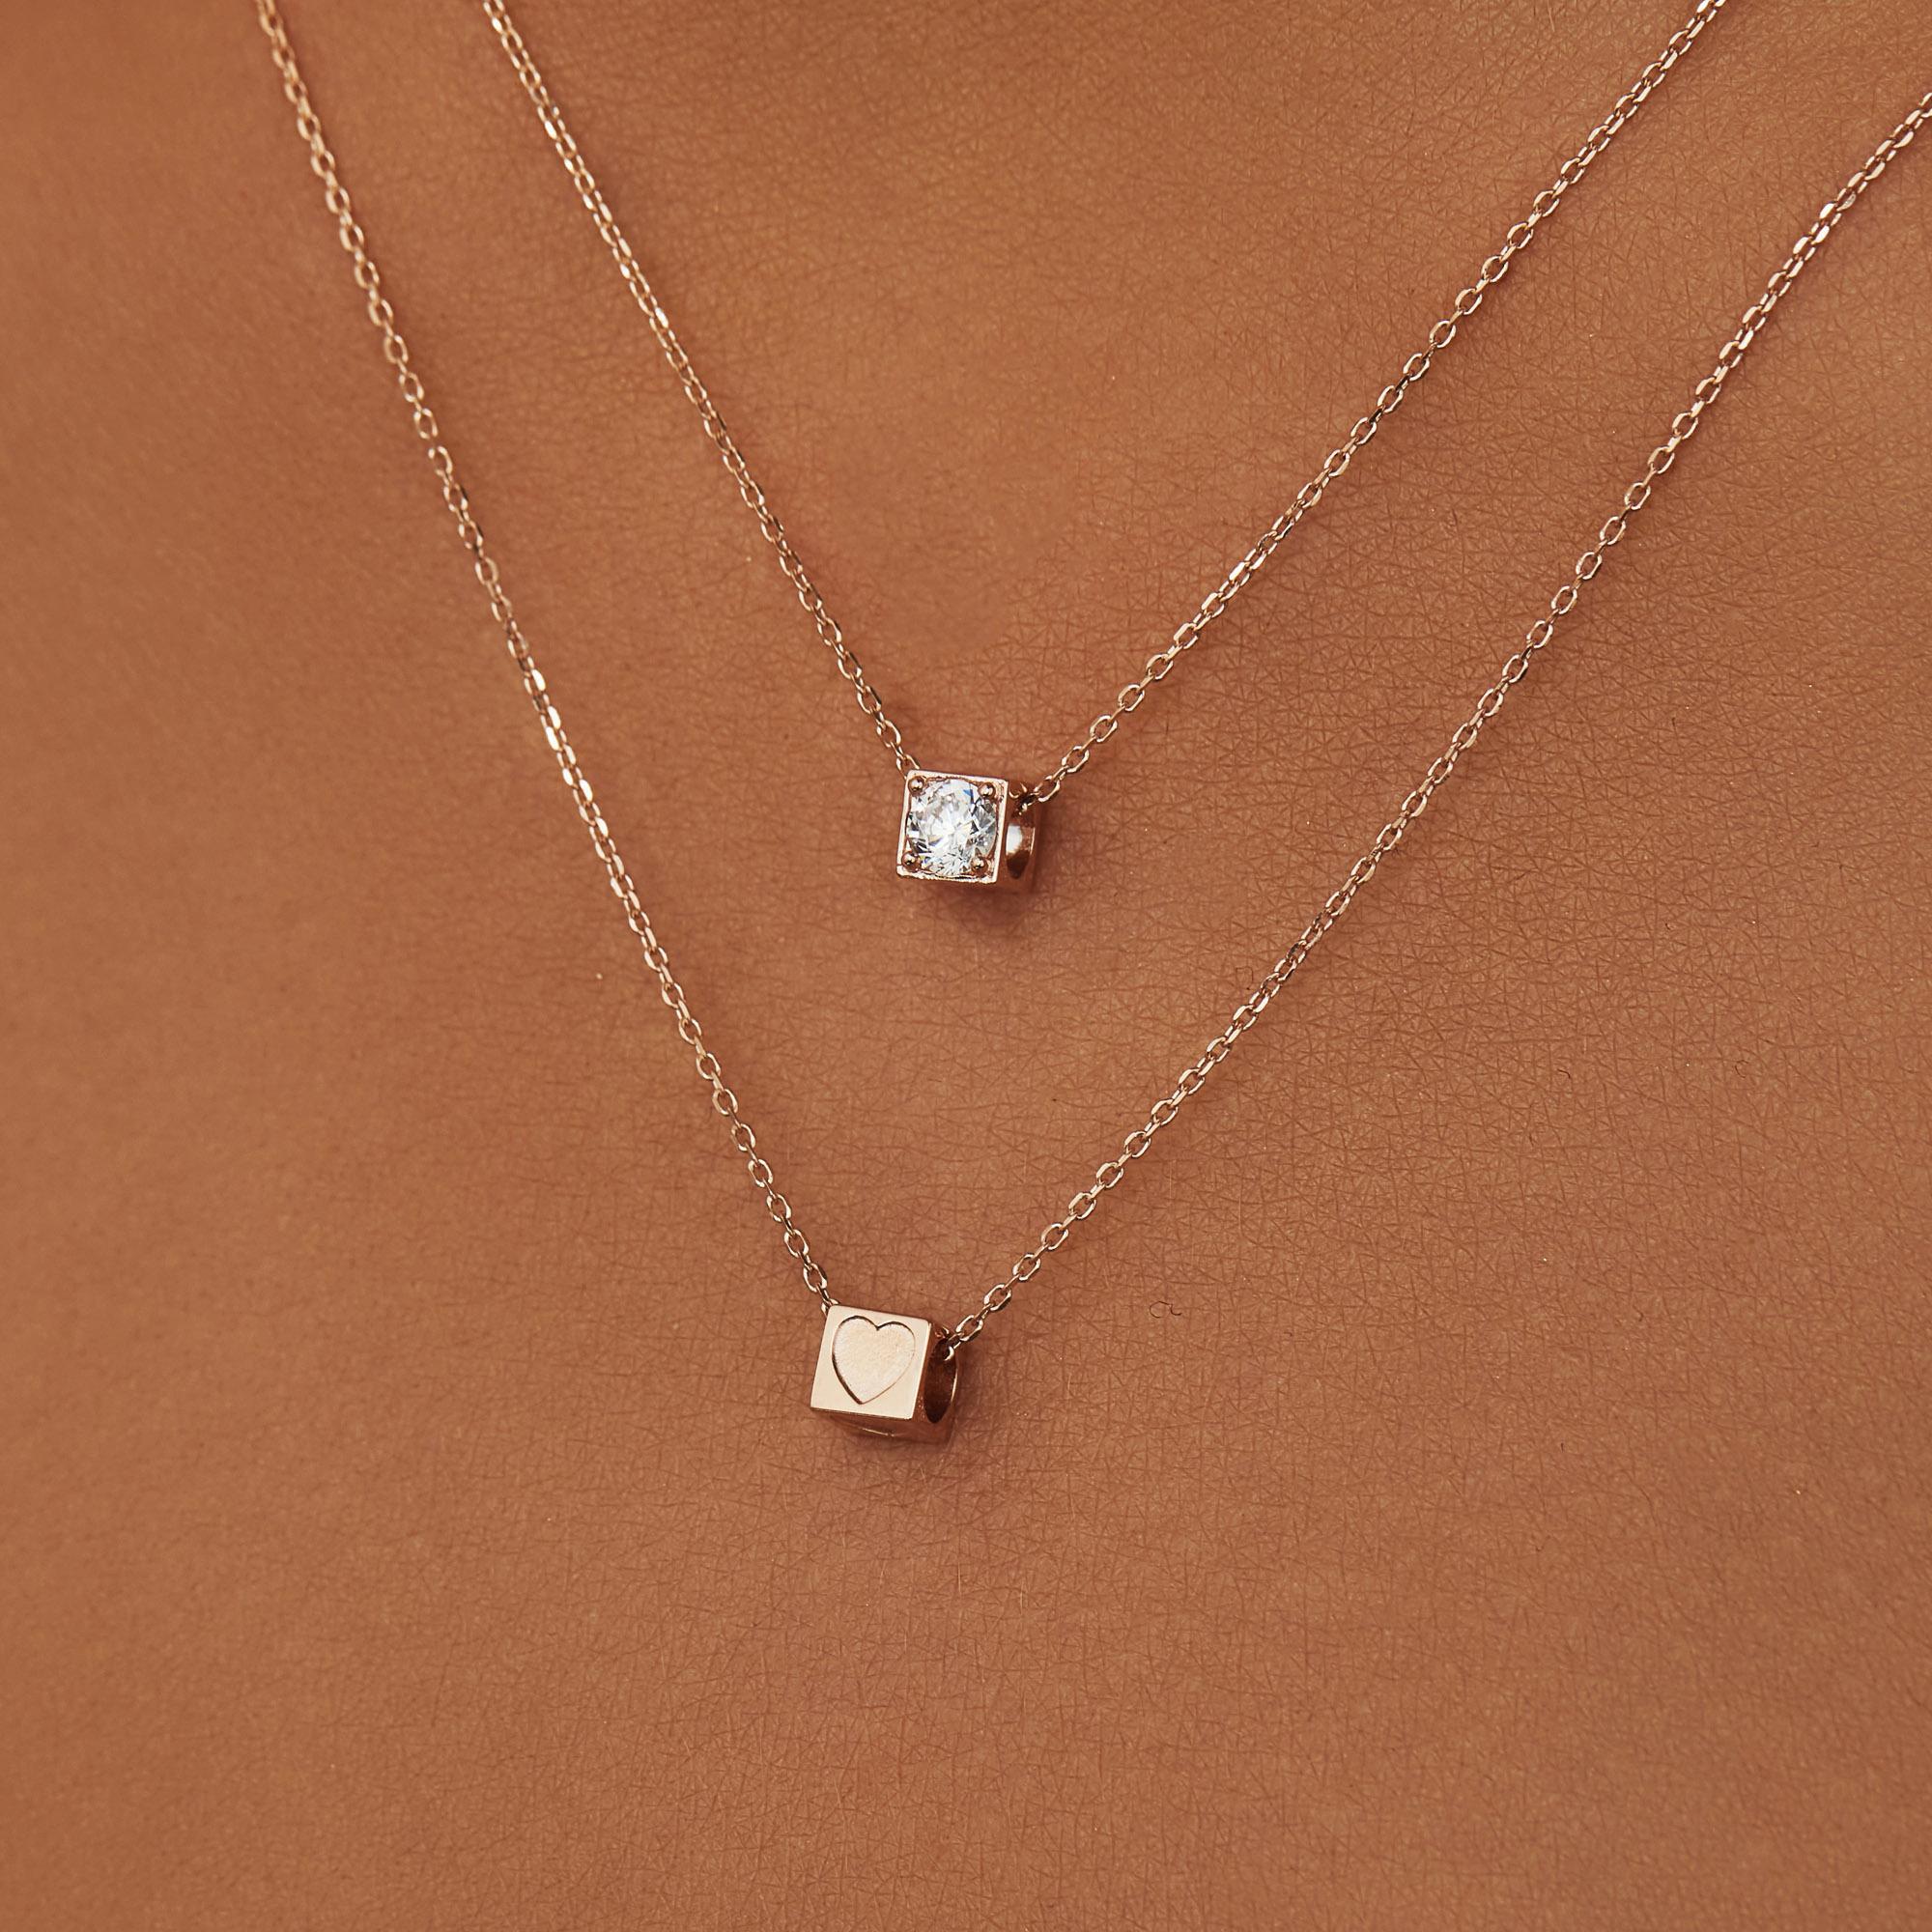 Isabel Bernard La Concorde Felie 14 karat rose guldkub charme